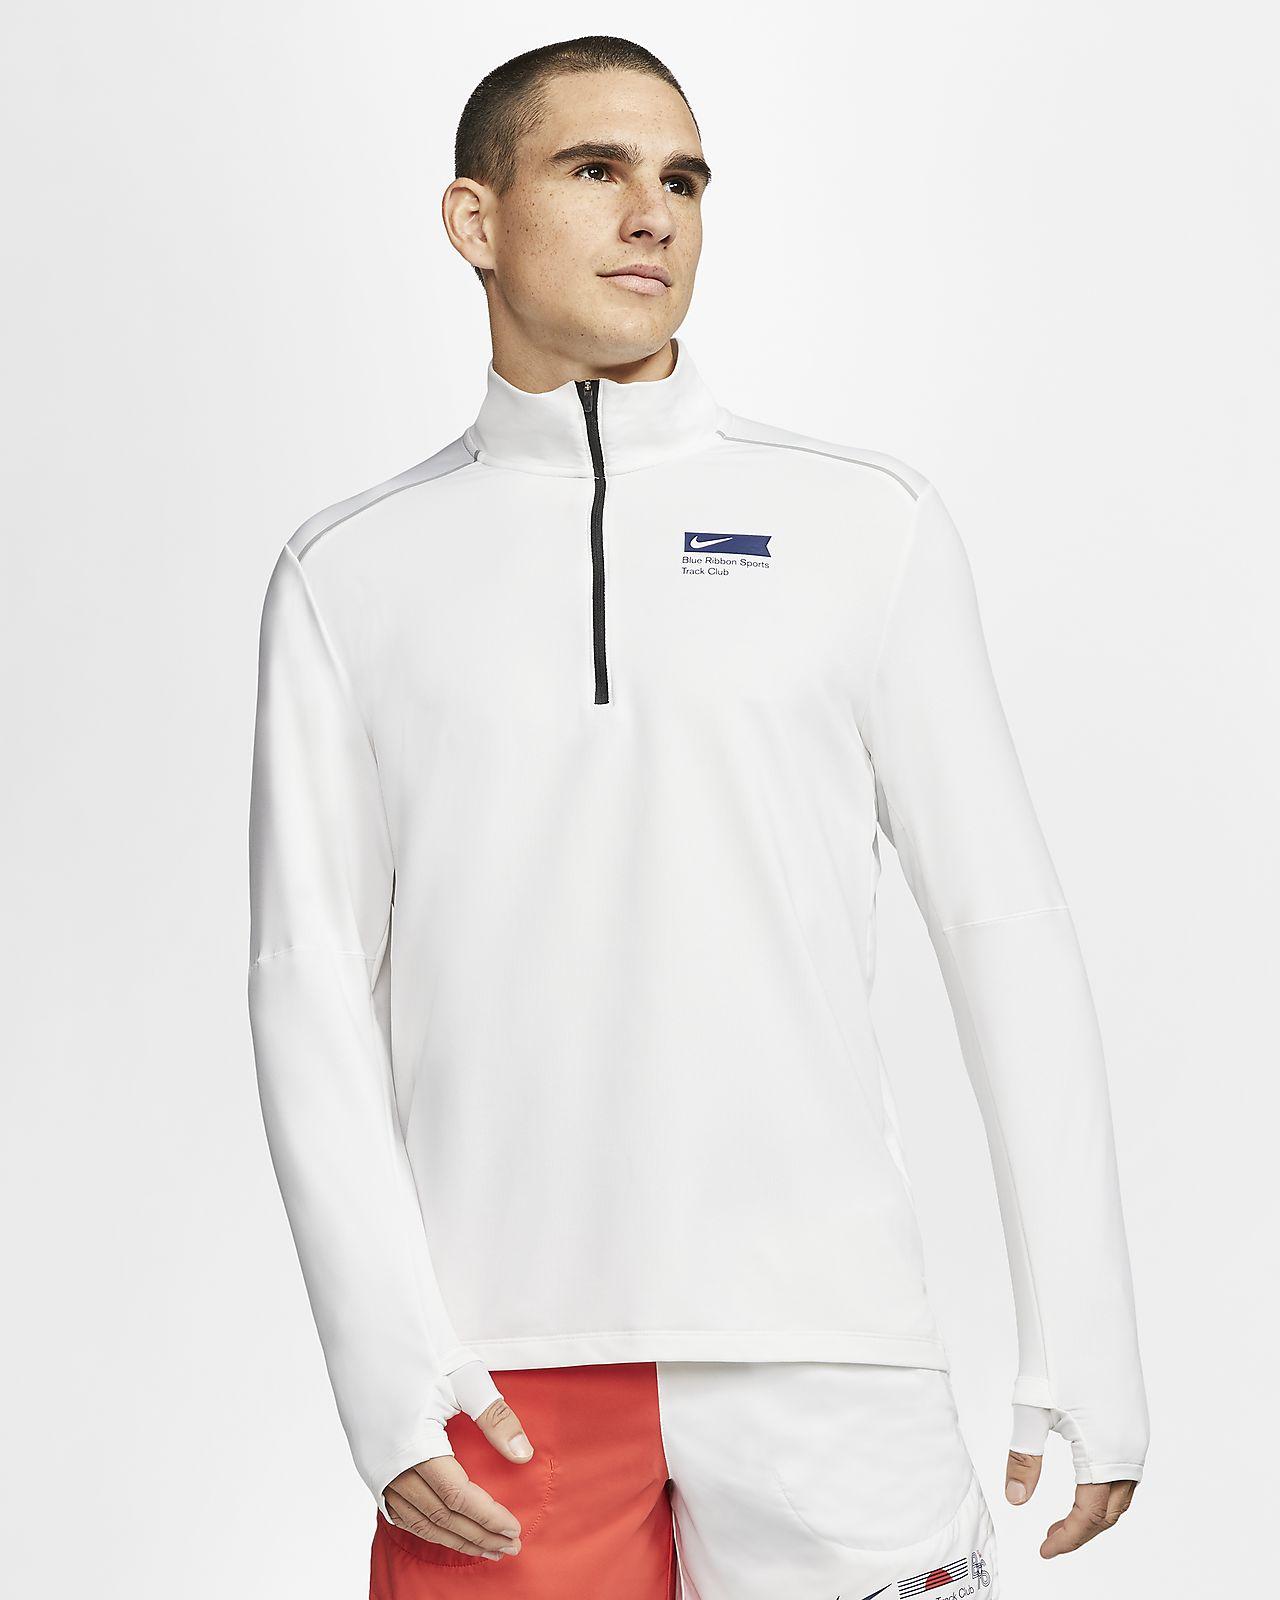 Prenda superior de running con medio cierre para hombre Nike Element Blue Ribbon Sports